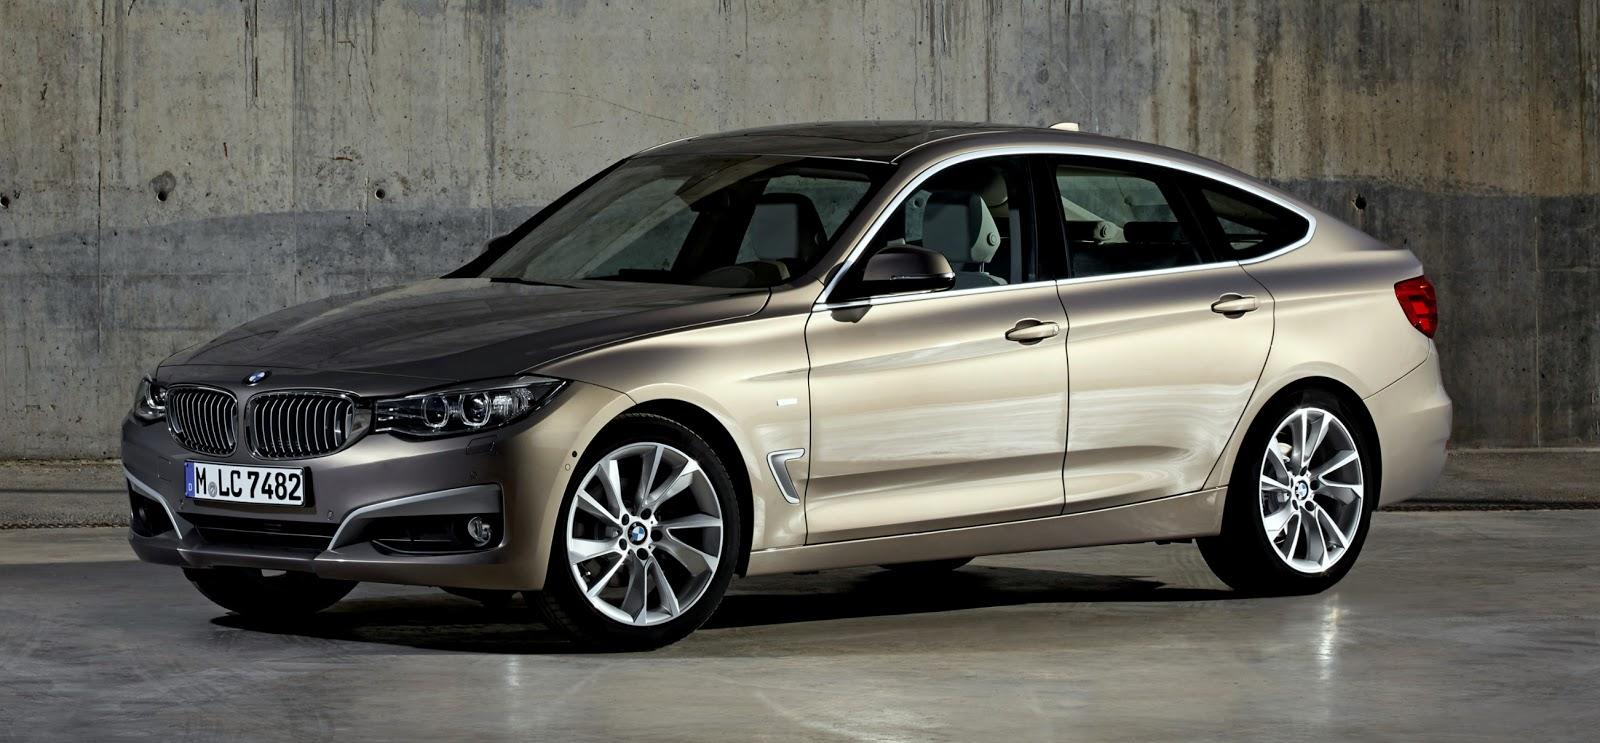 All BMW Models bmw 328i gran turismo uautoknow.net: 2014 BMW 3-Series Gran Turismo debuts - Update